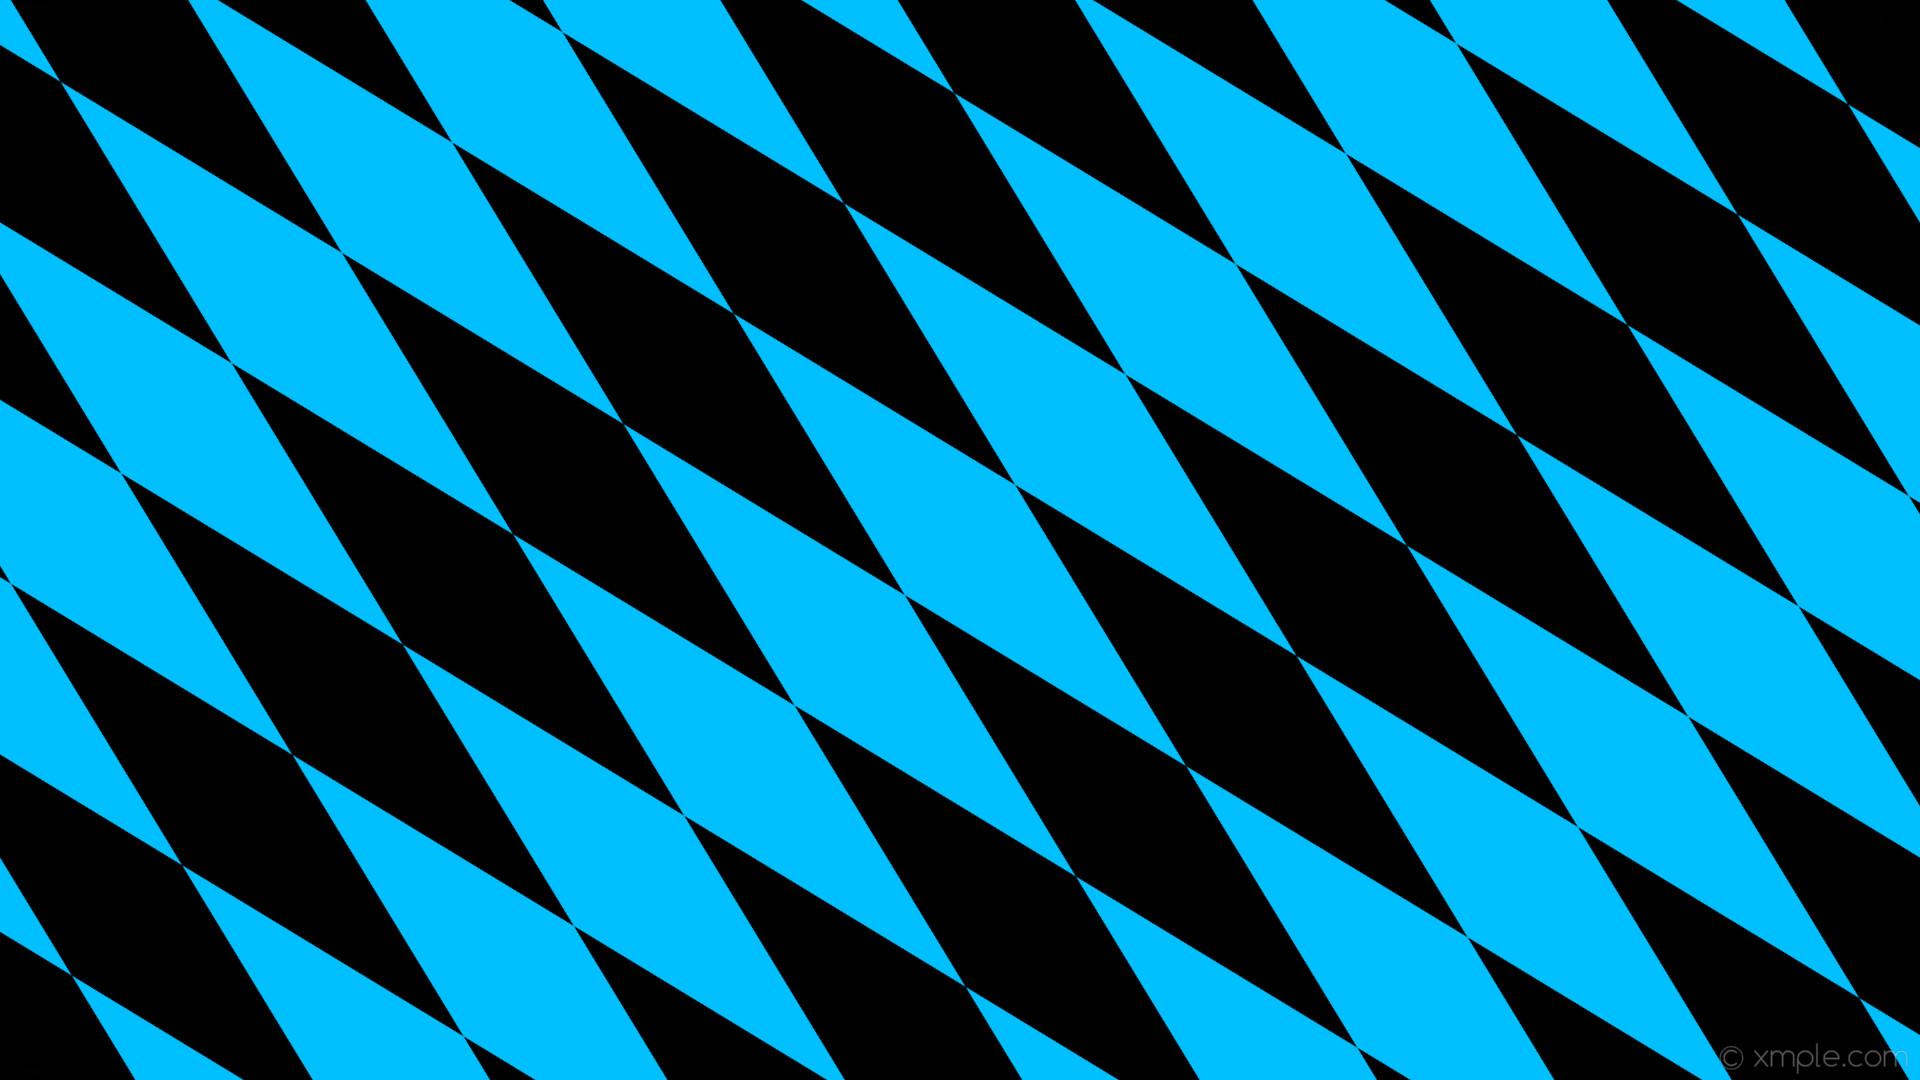 wallpaper rhombus lozenge black diamond blue deep sky blue #00bfff #000000  135° 640px